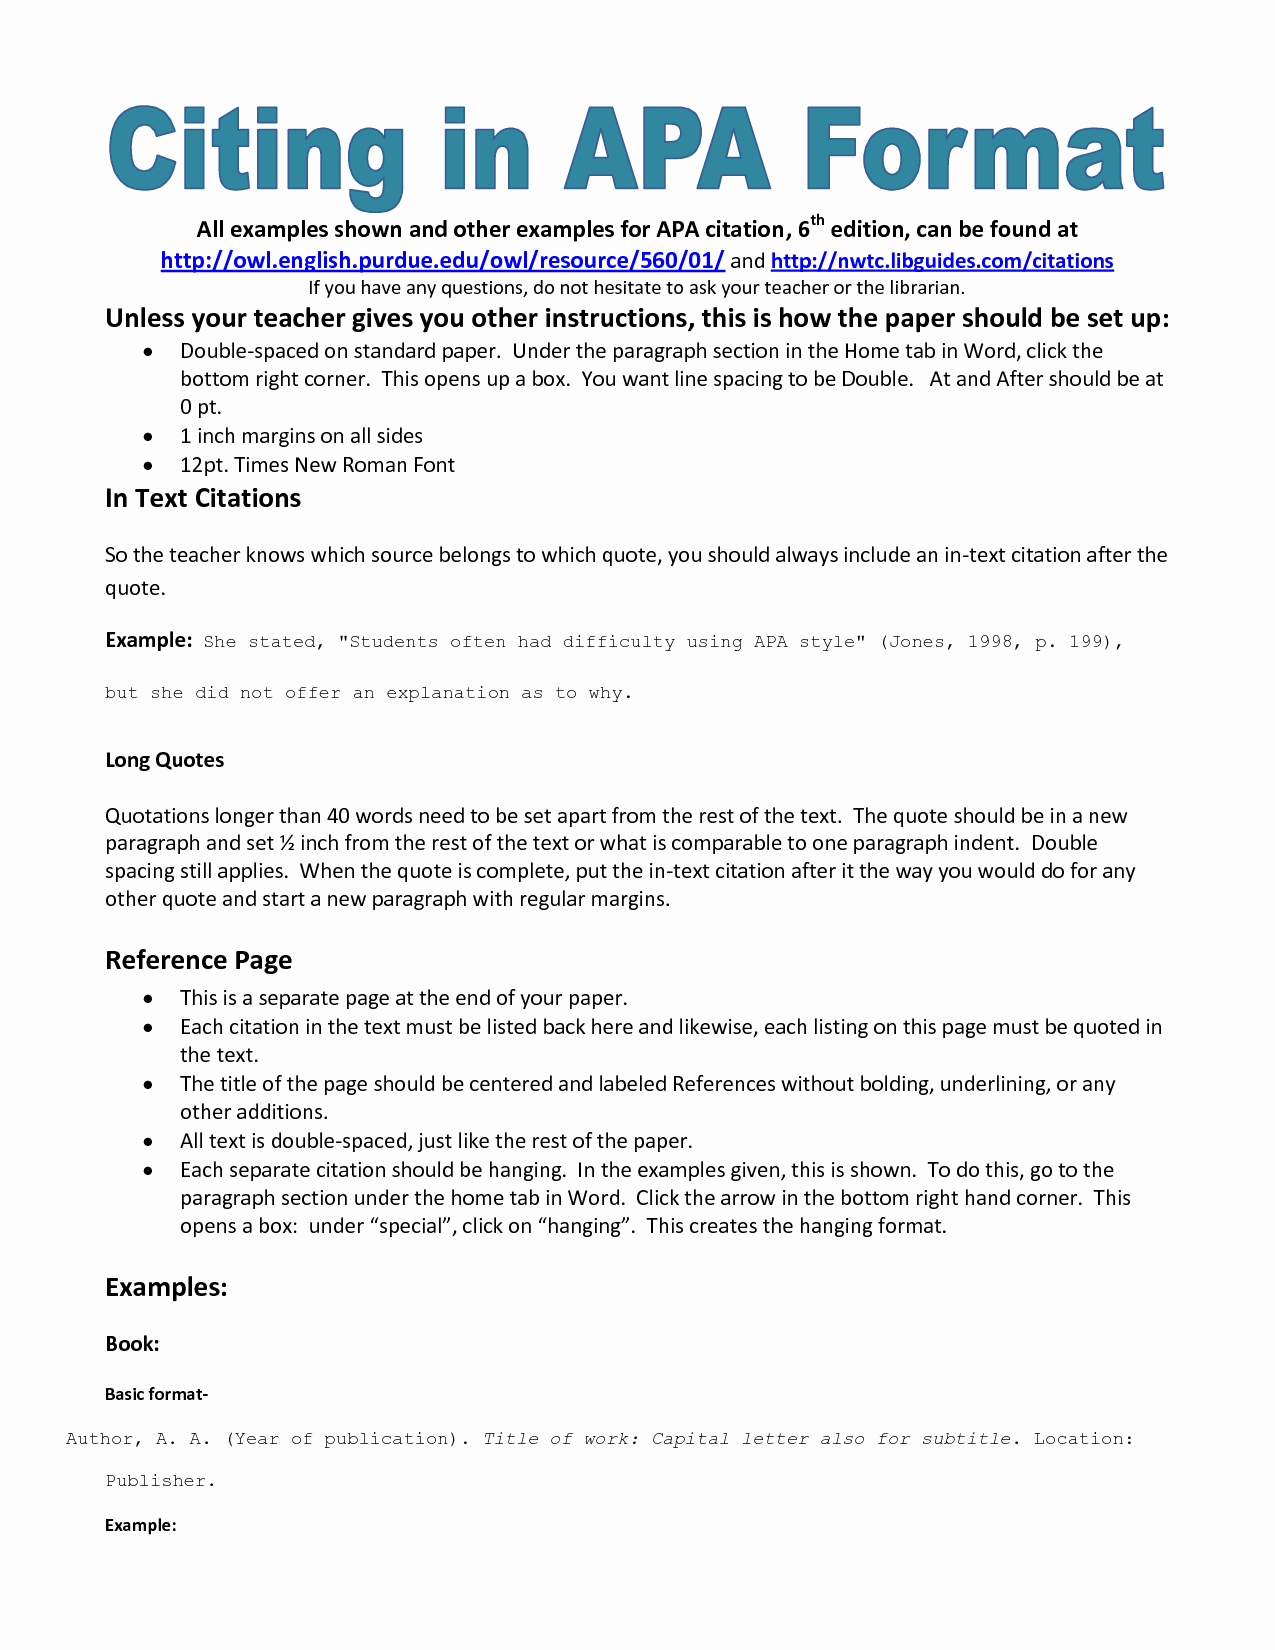 Samples Of Apa format Inspirational Apa format Citation Obfuscata